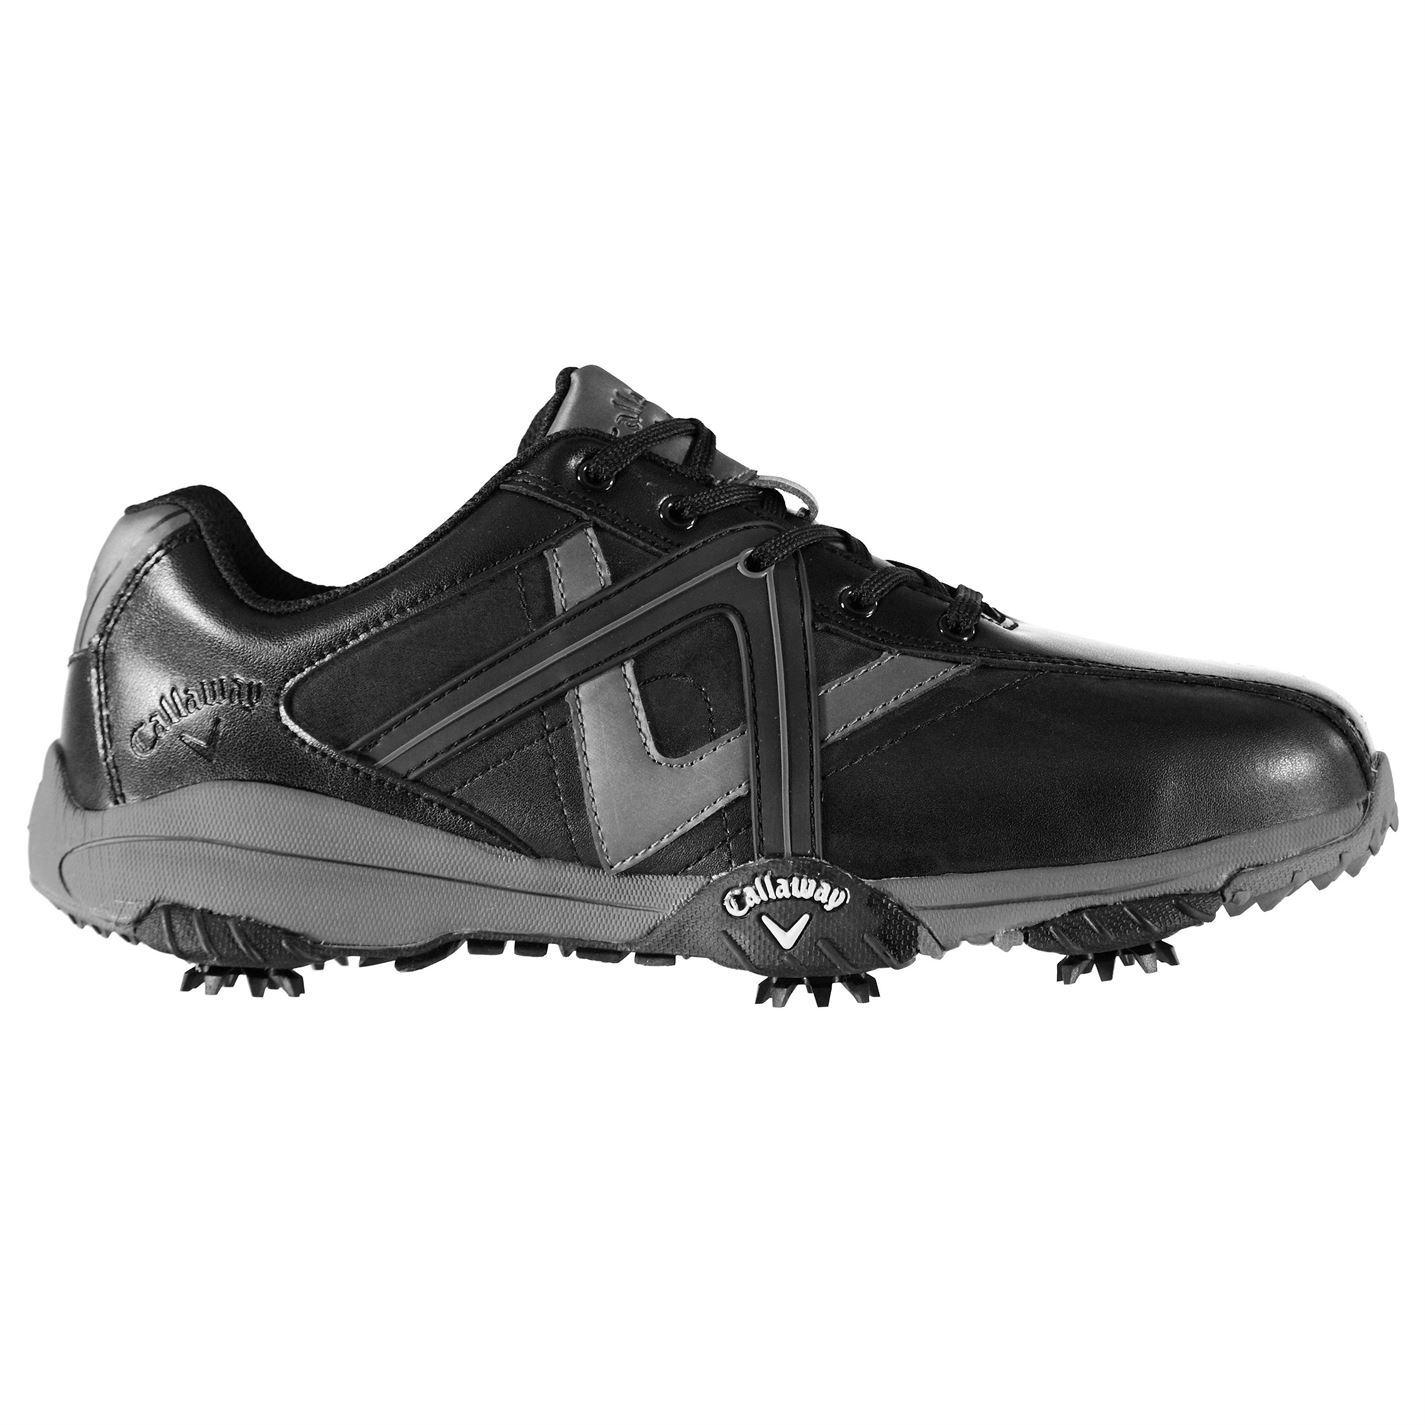 Callaway-Cheviot-ll-Golf-Shoes-Mens-Spikes-Footwear thumbnail 8